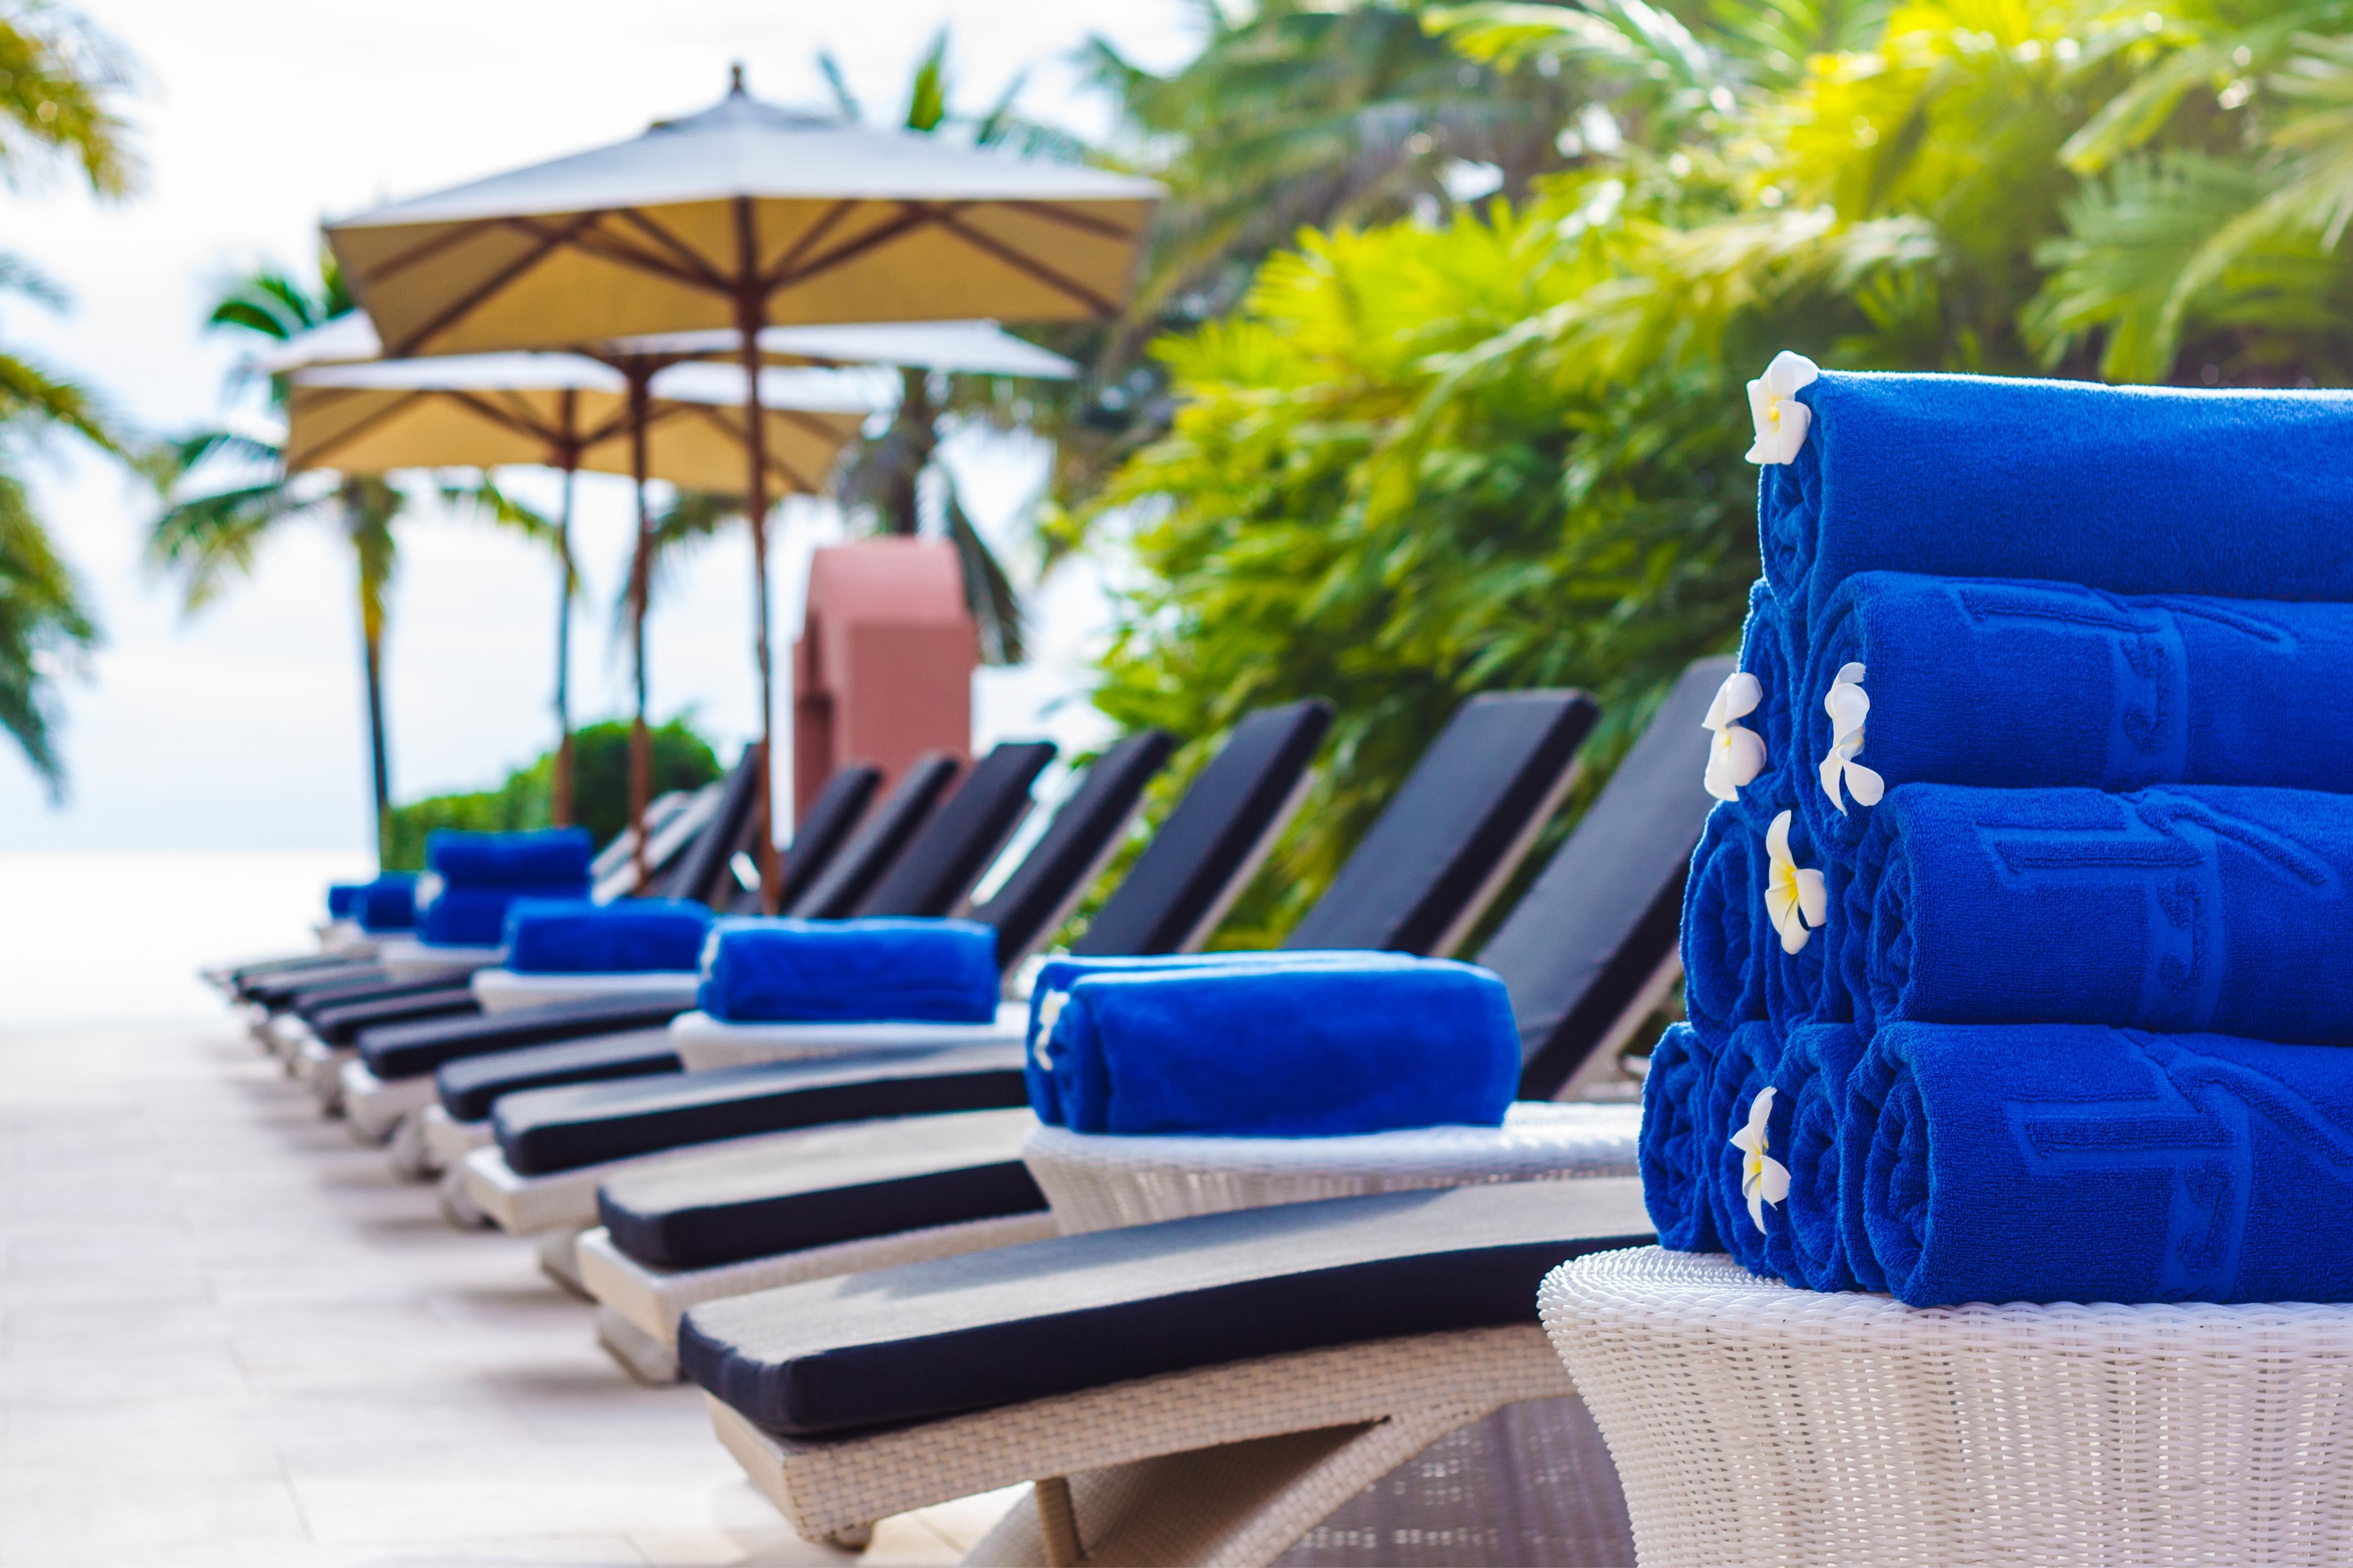 Uni colour relief woven resort towel